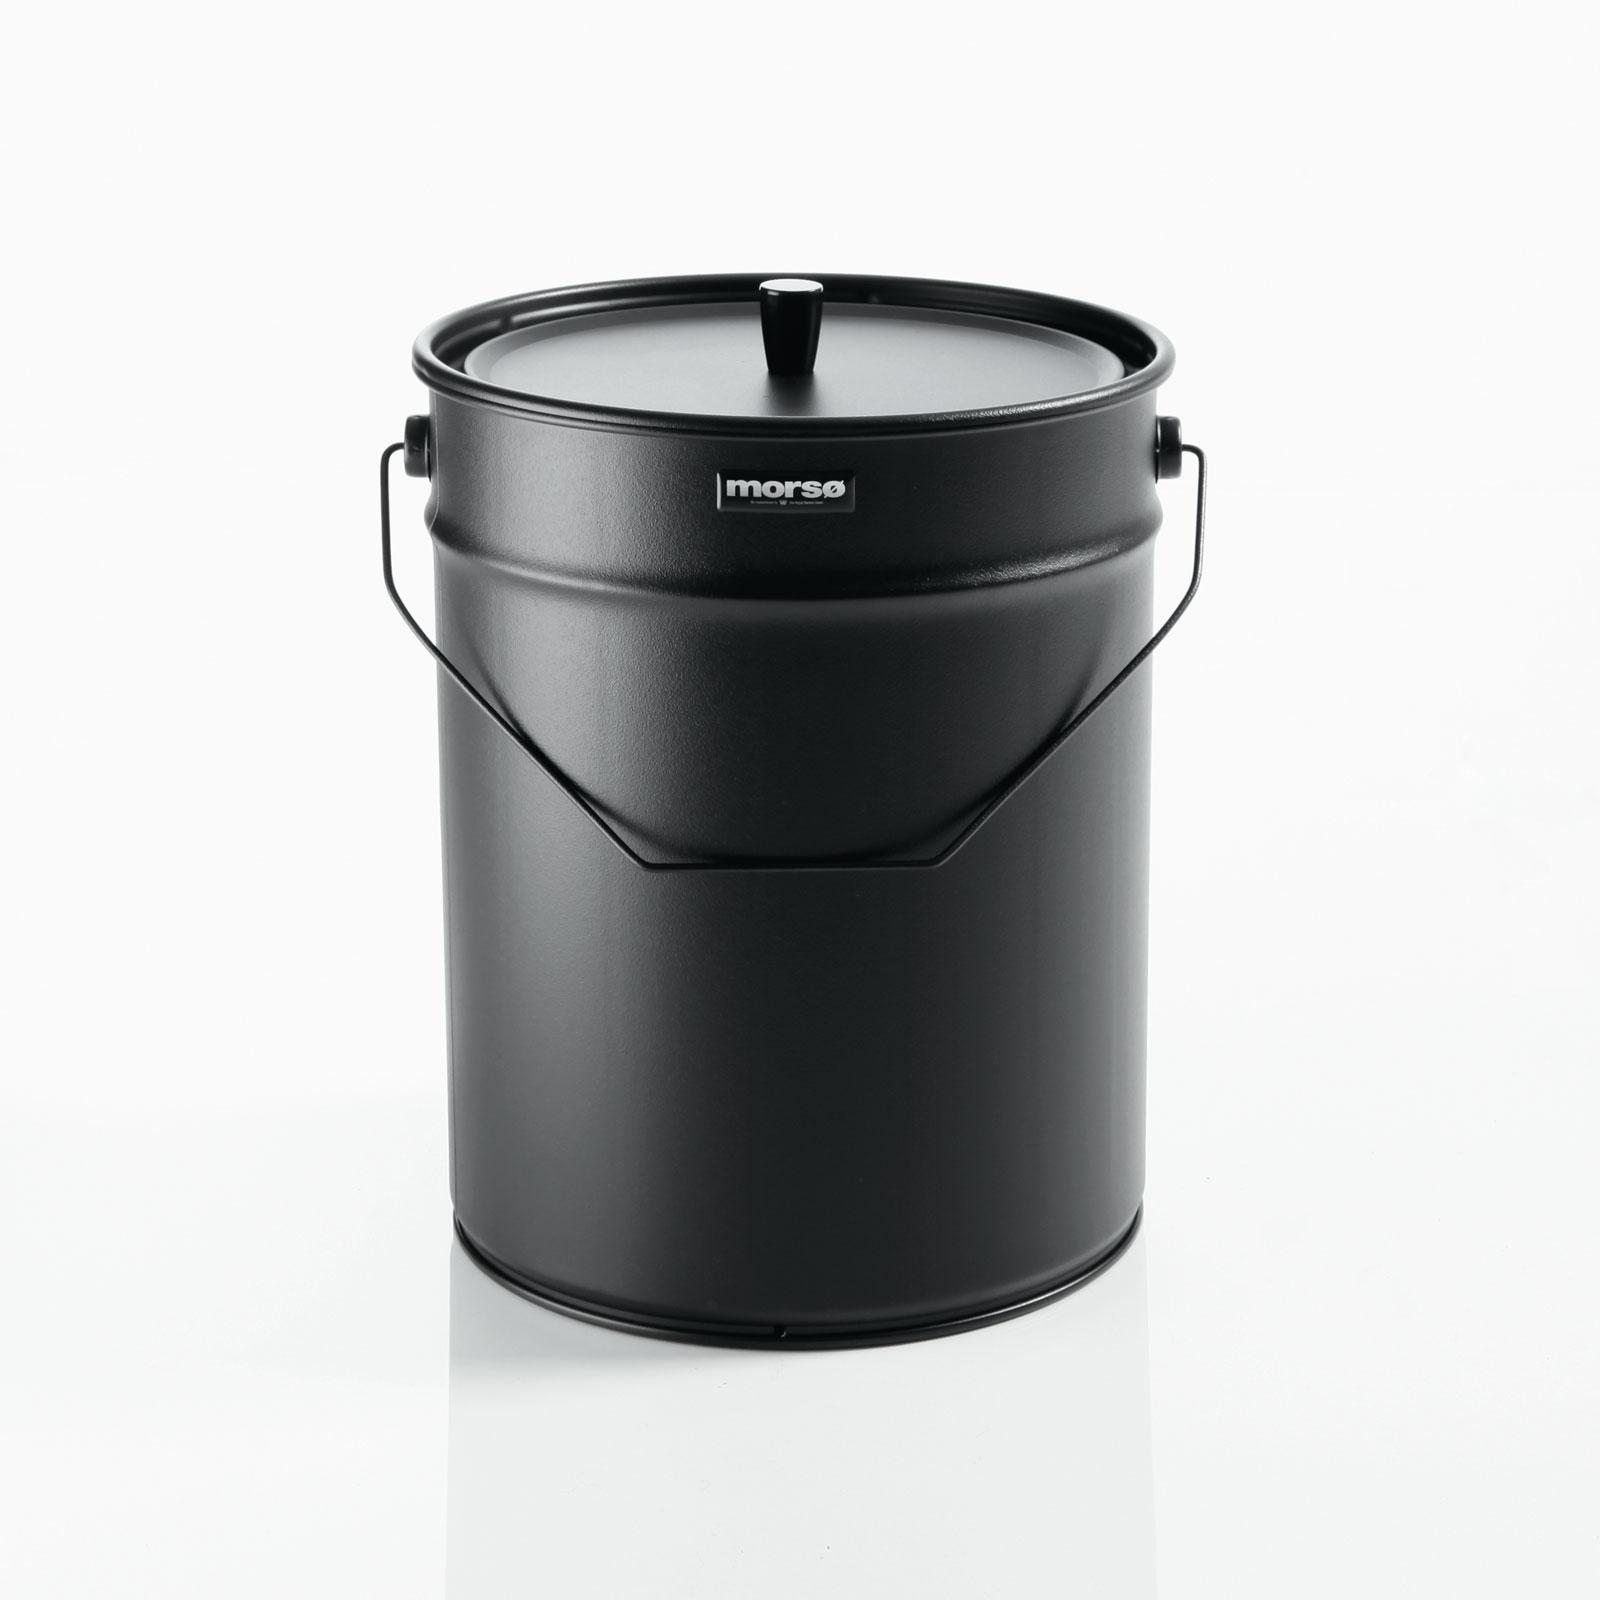 Morso ash storage bucket with handle and lid on